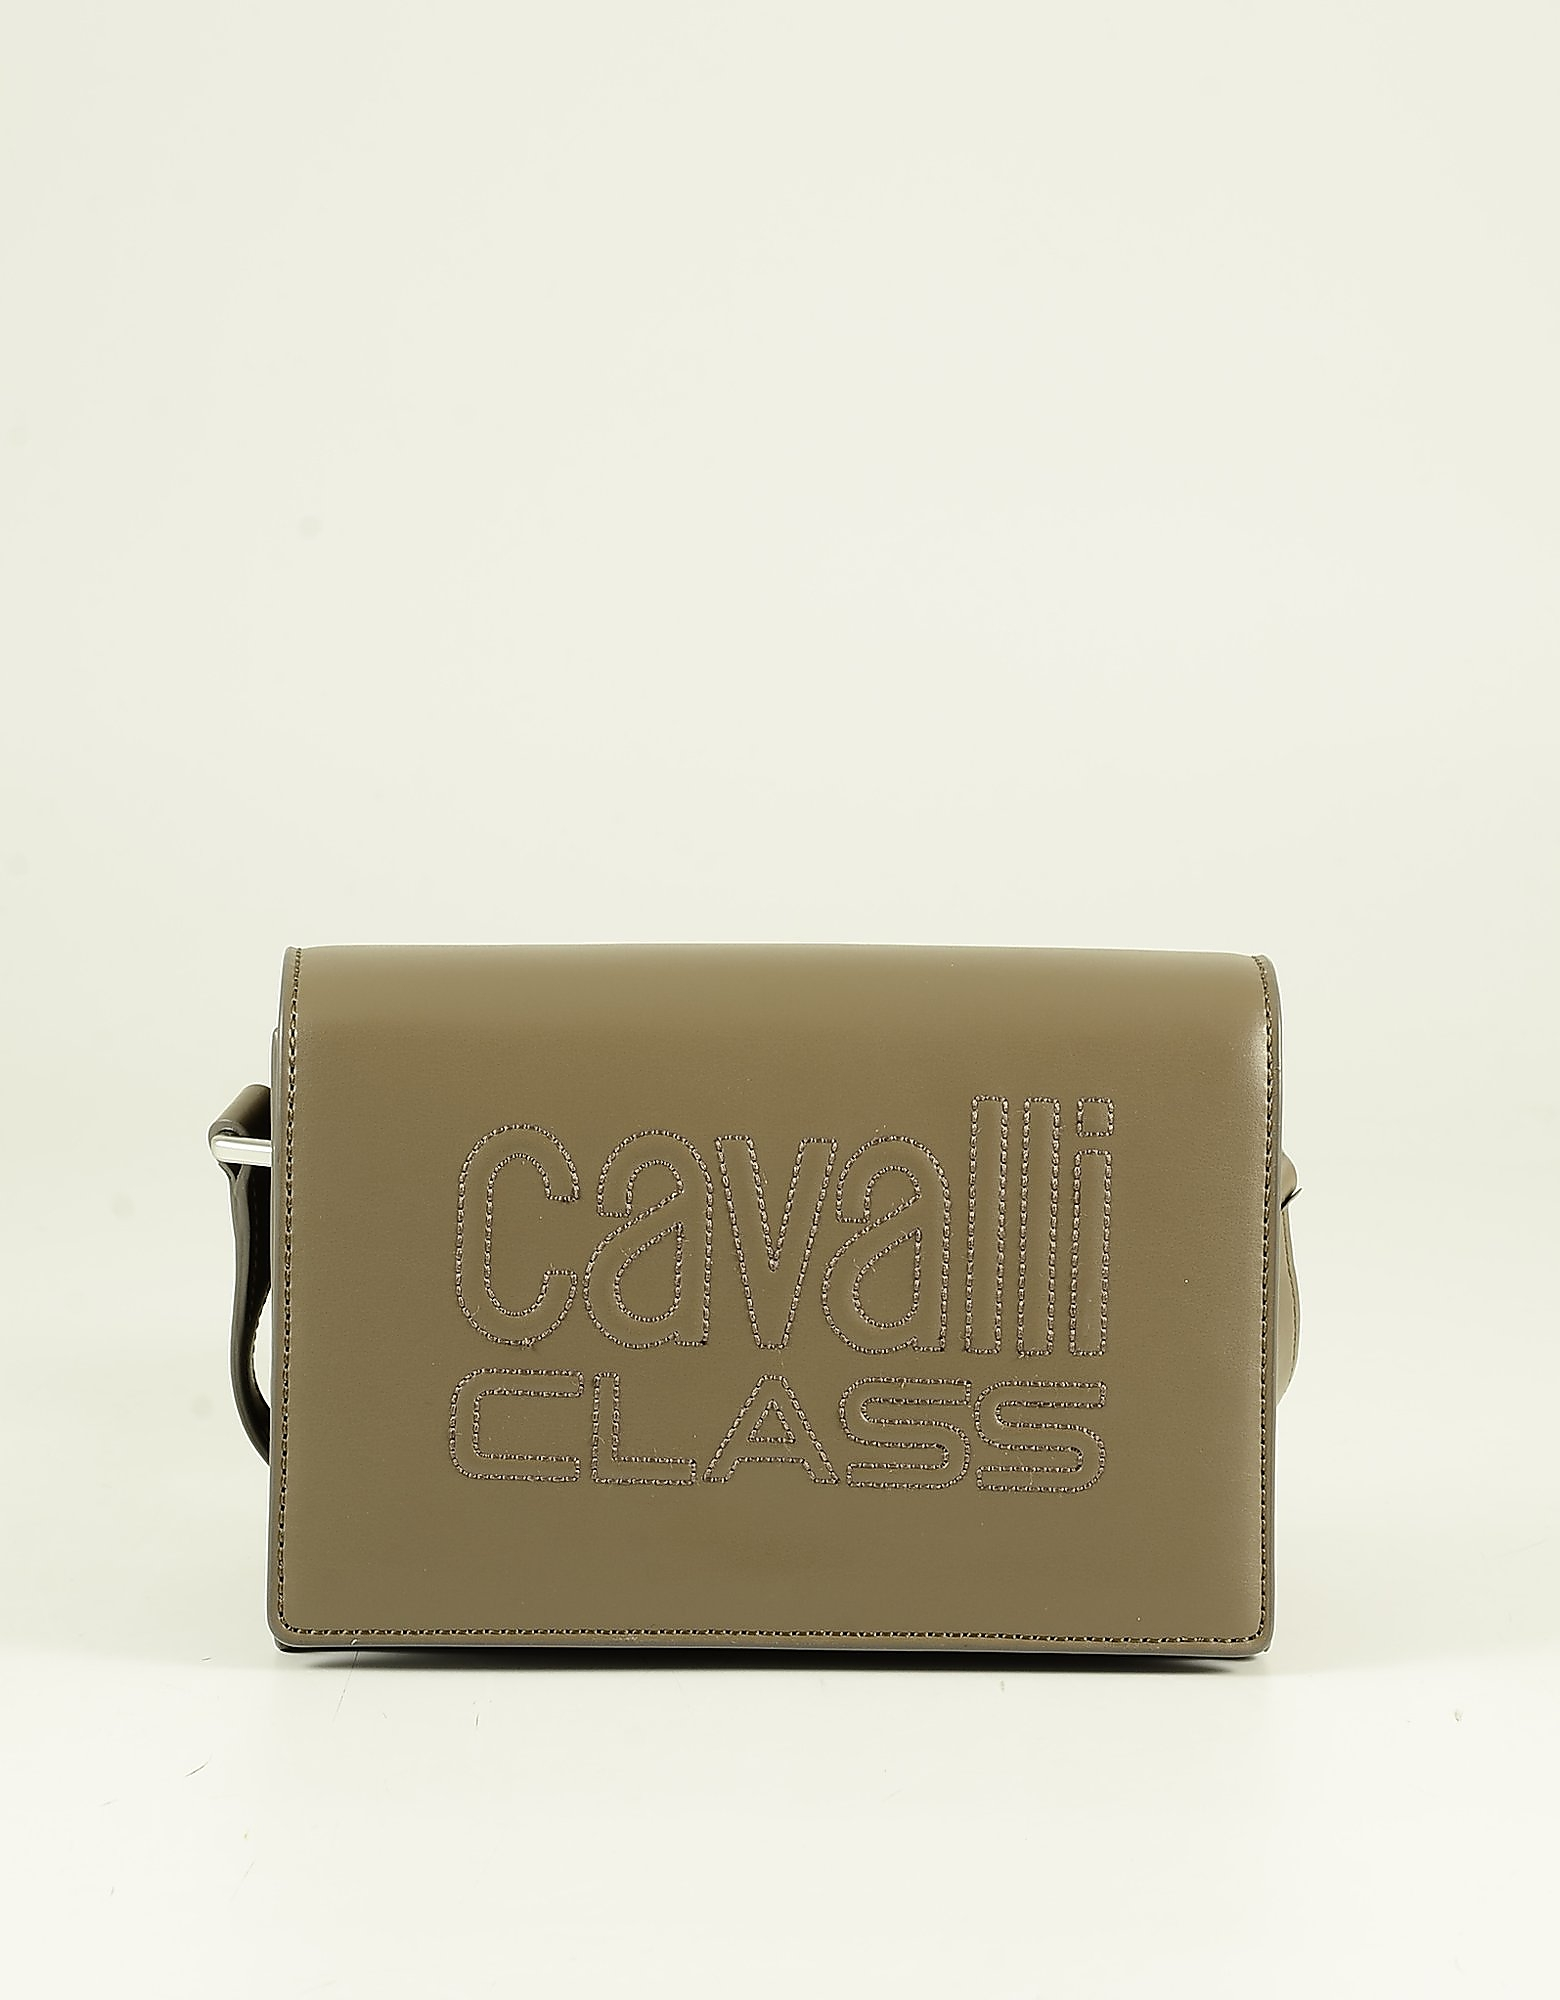 Class Roberto Cavalli Brown Eco Leather Signature Shoulder Bag